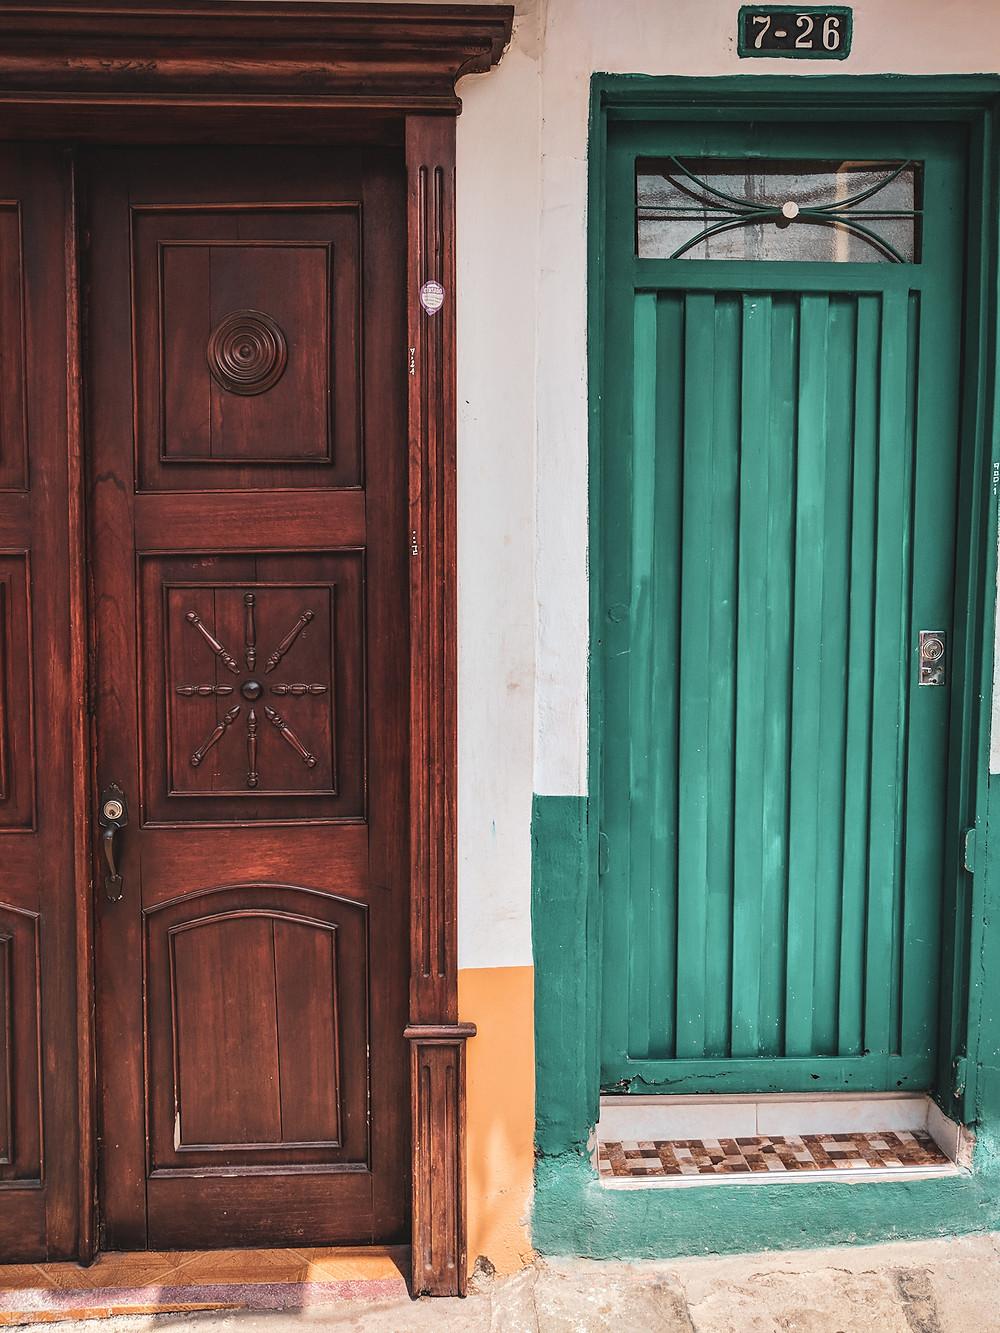 Colorful doorways in Jardin, Colombia.